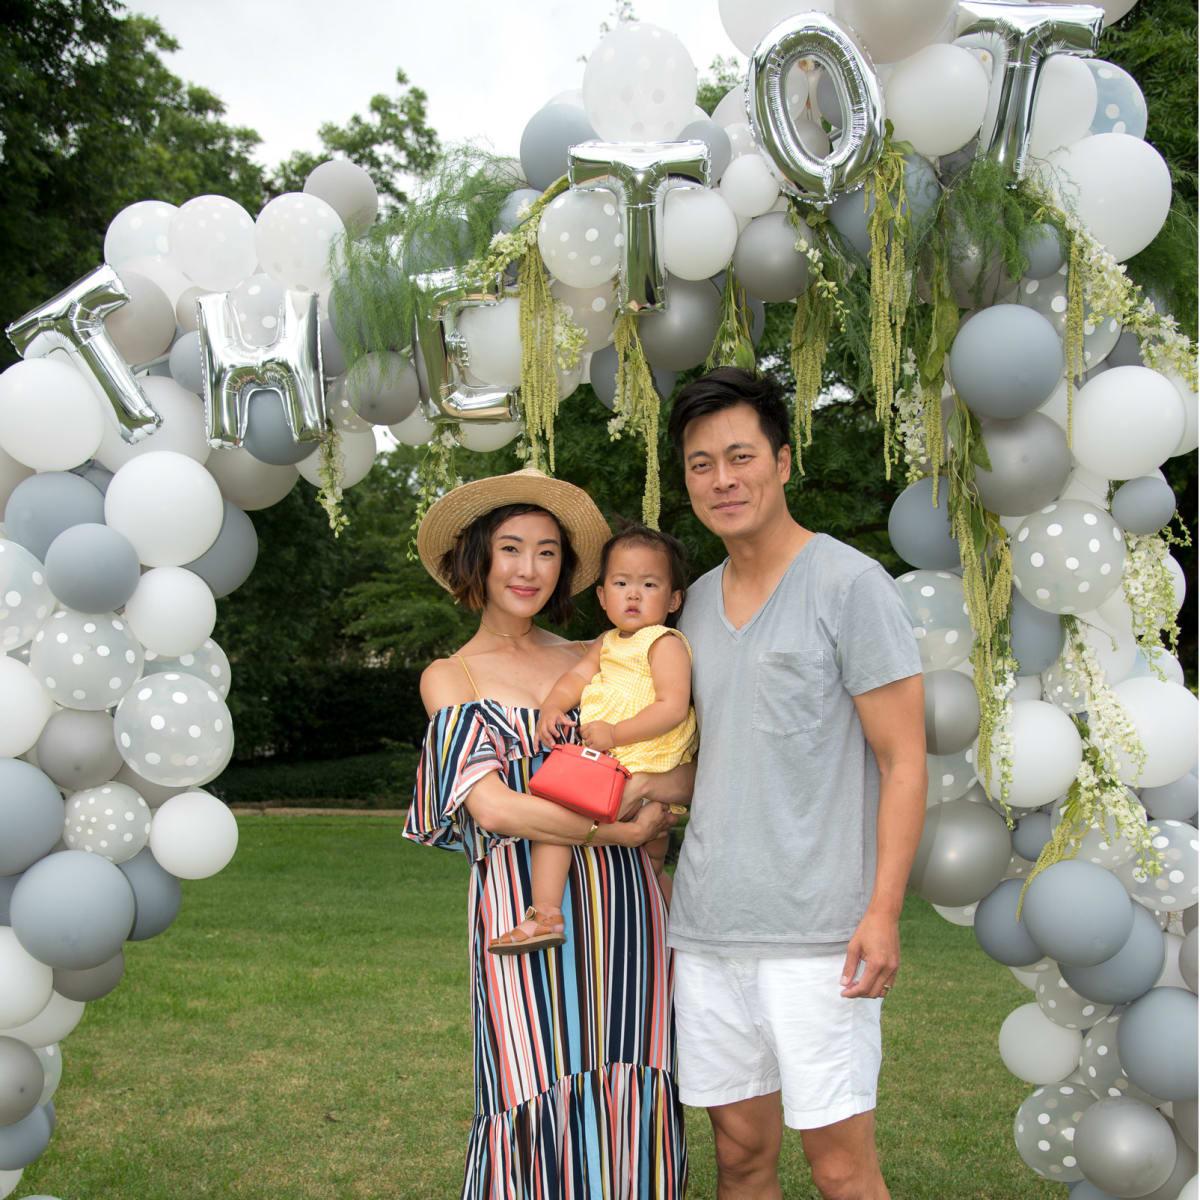 Chriselle Lim, Allen Lim